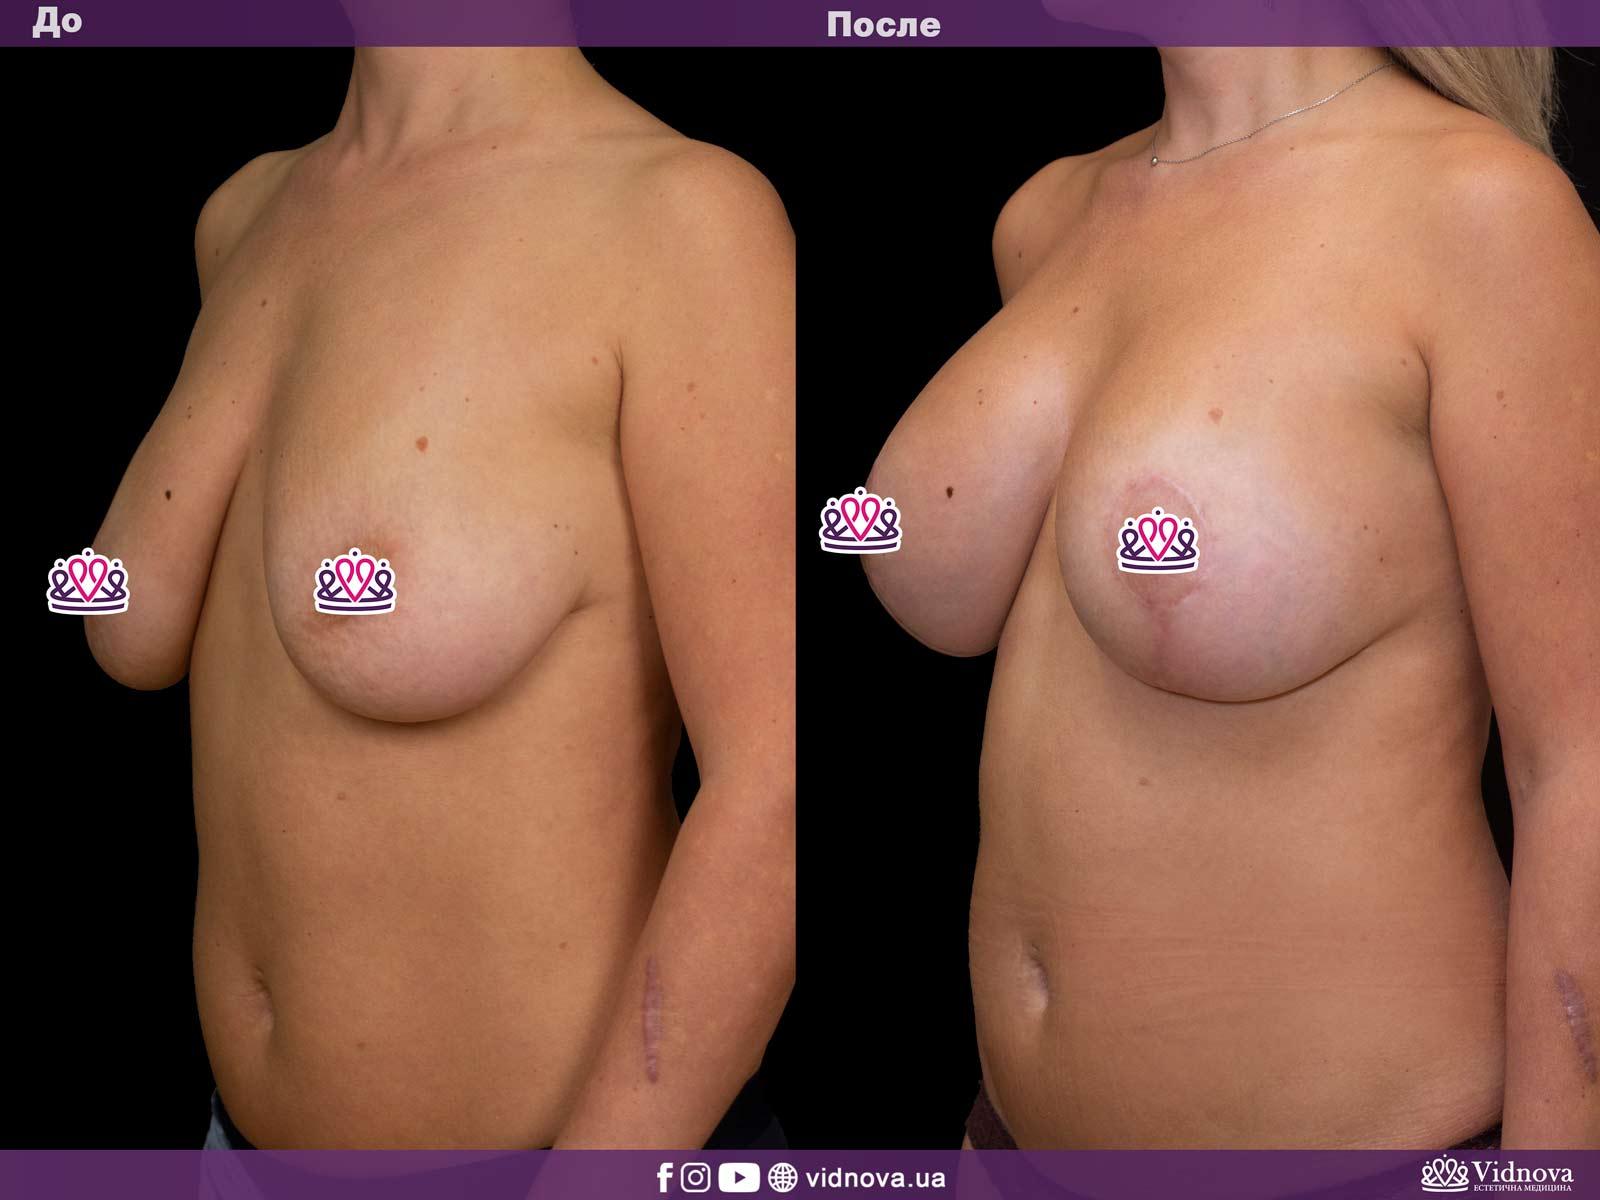 Подтяжка груди: Фото ДО и ПОСЛЕ - Пример №6-2 - Клиника Vidnova